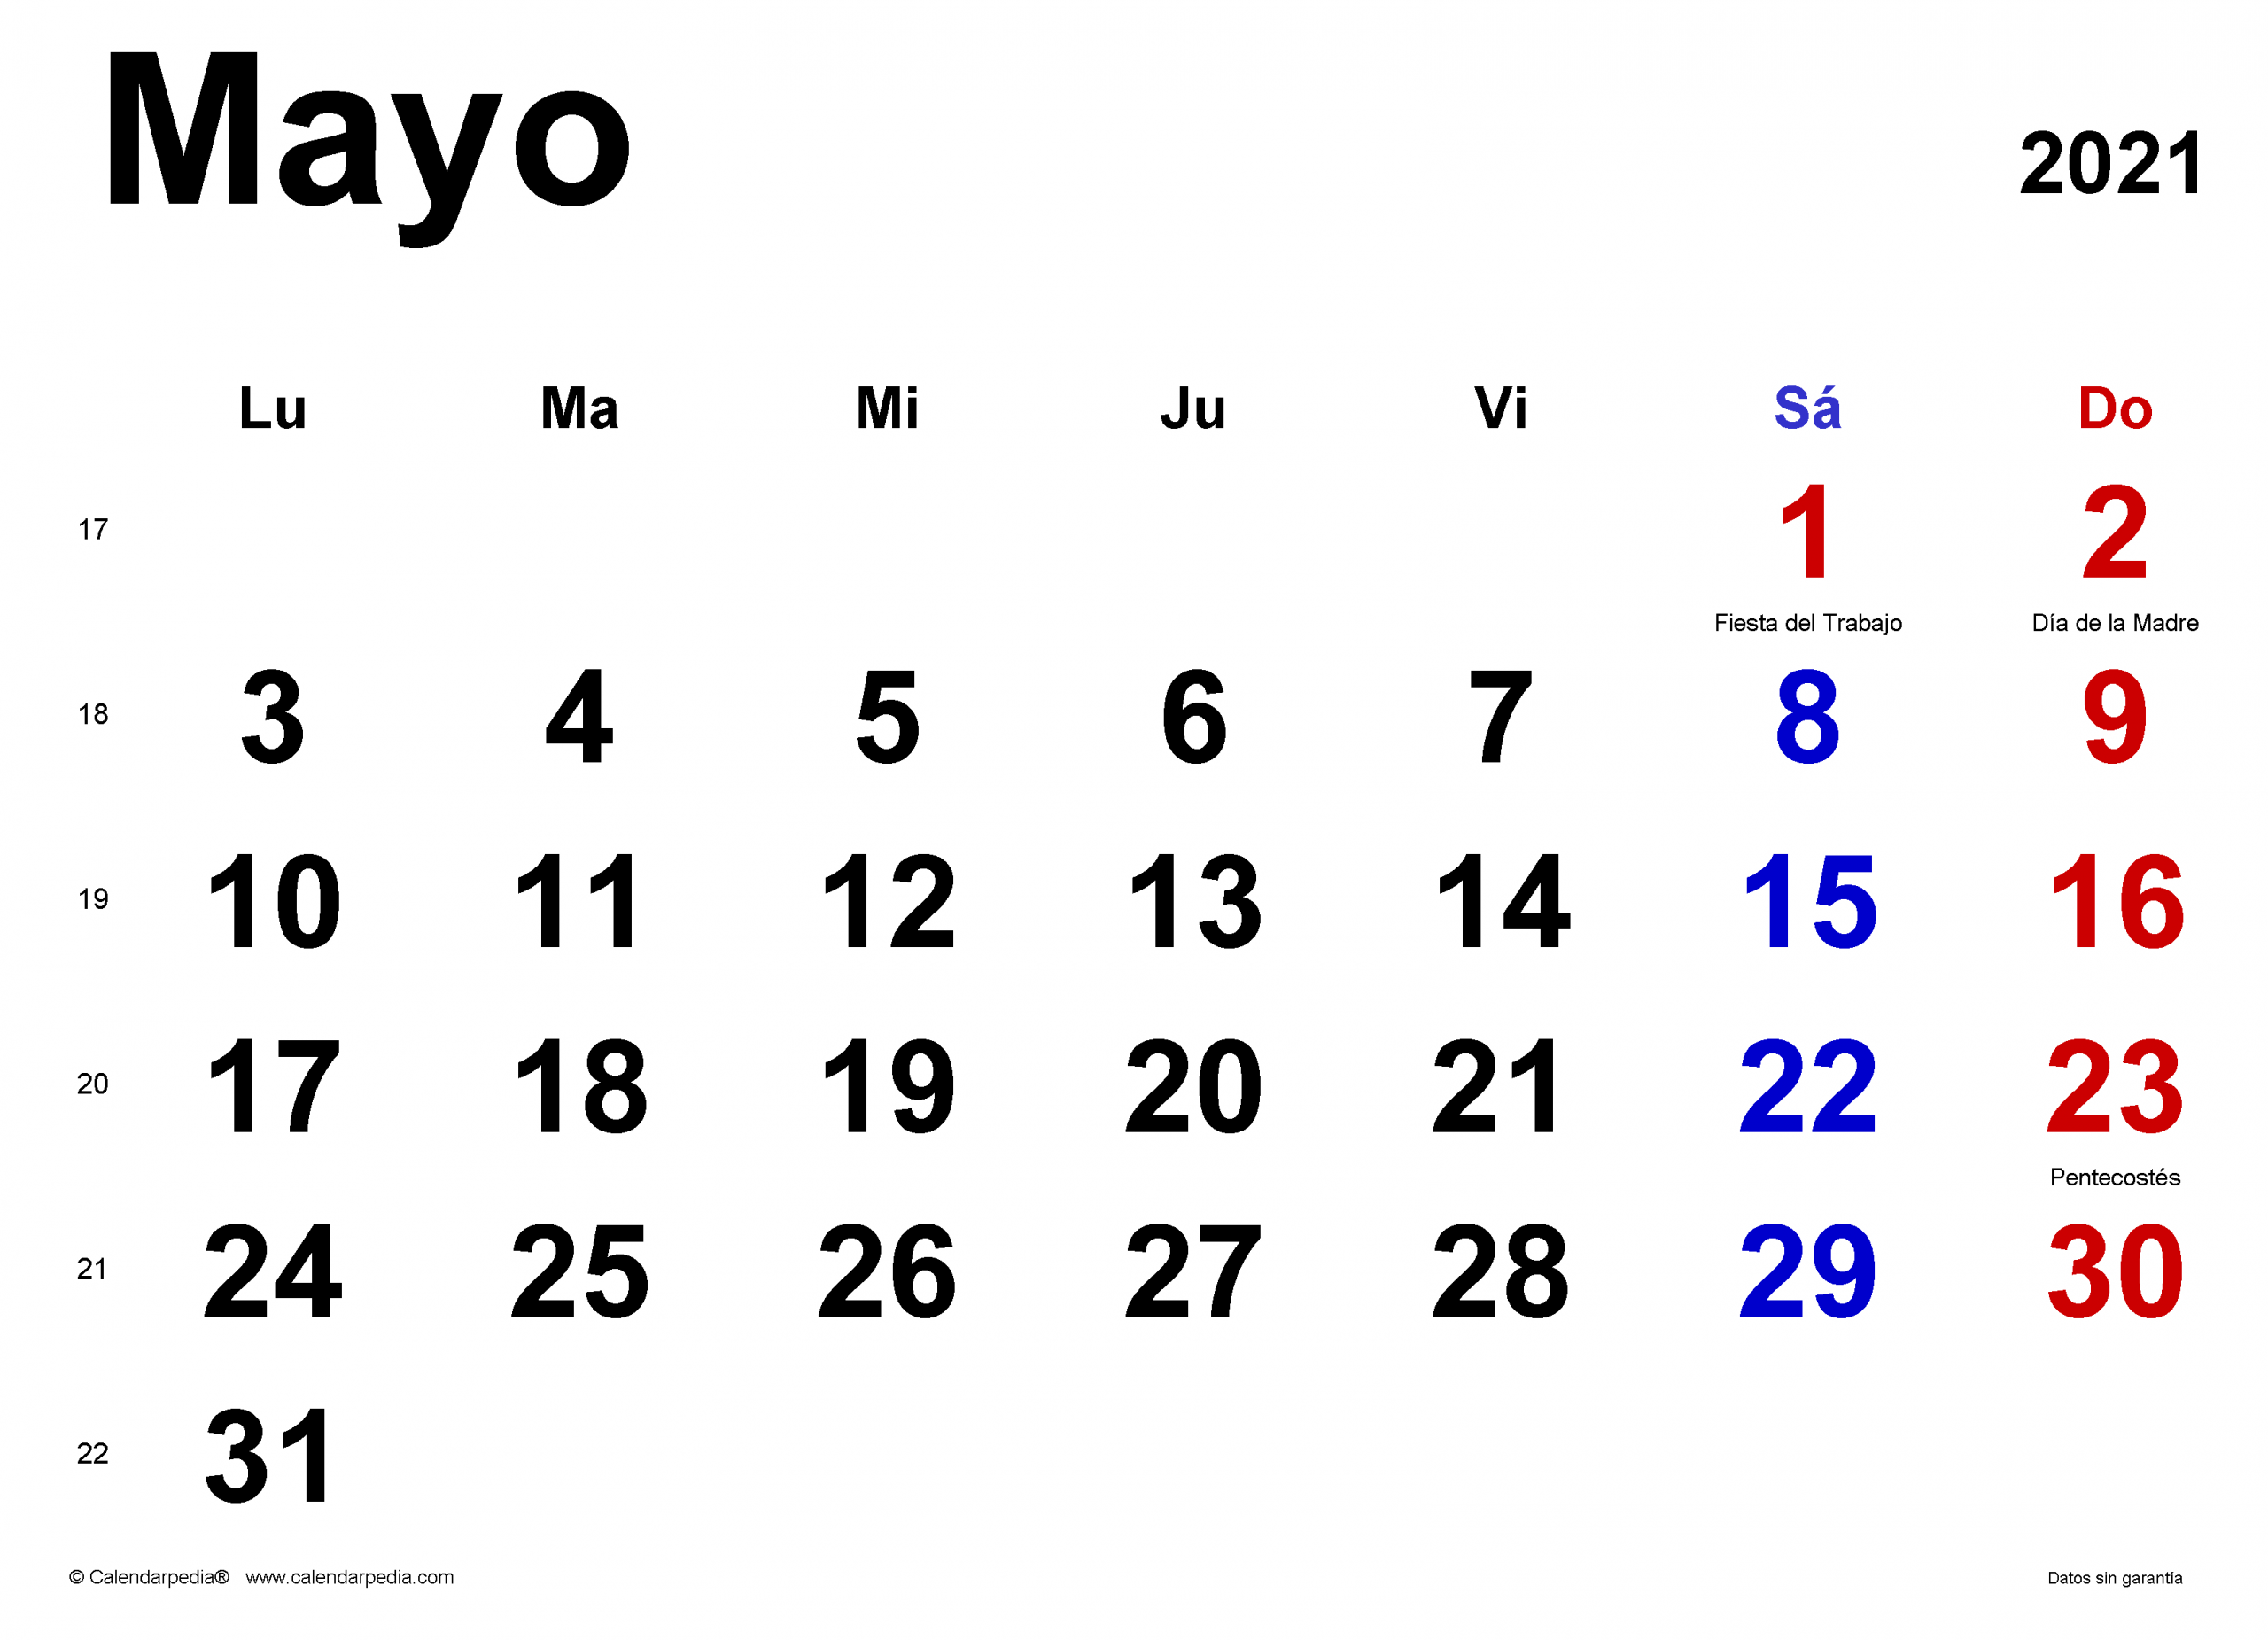 Calendario Mayo 2021 - Calendarpedia